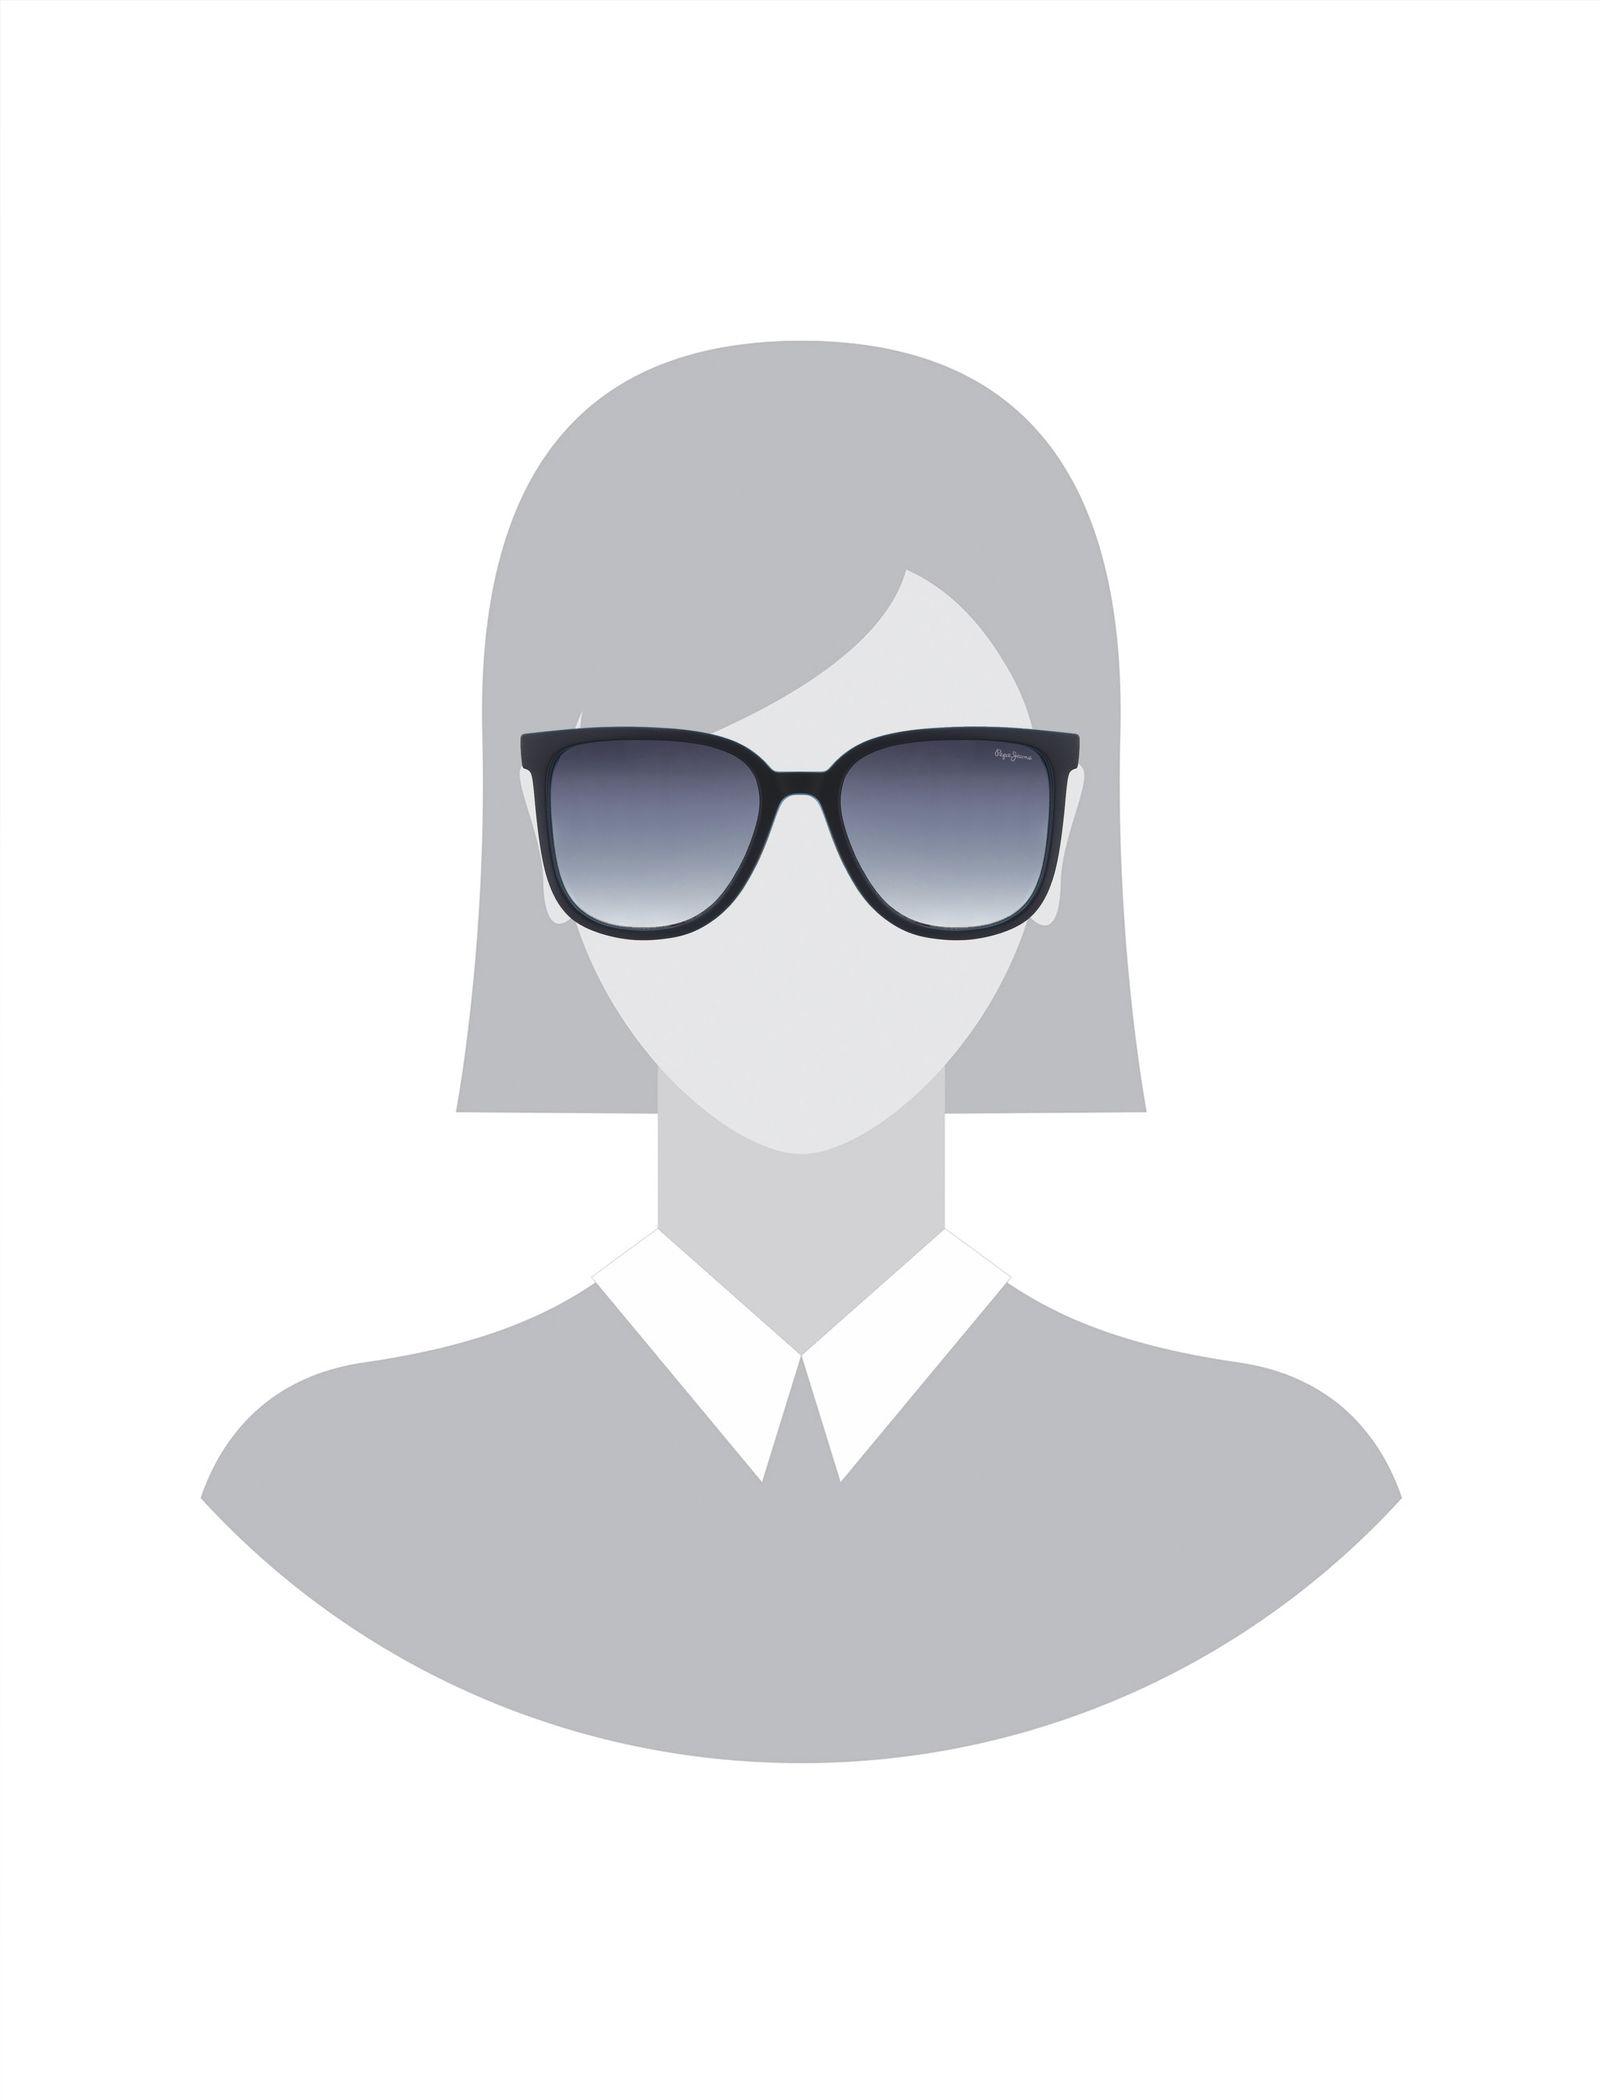 عینک آفتابی ویفرر زنانه - پپه جینز - سرمه اي - 5